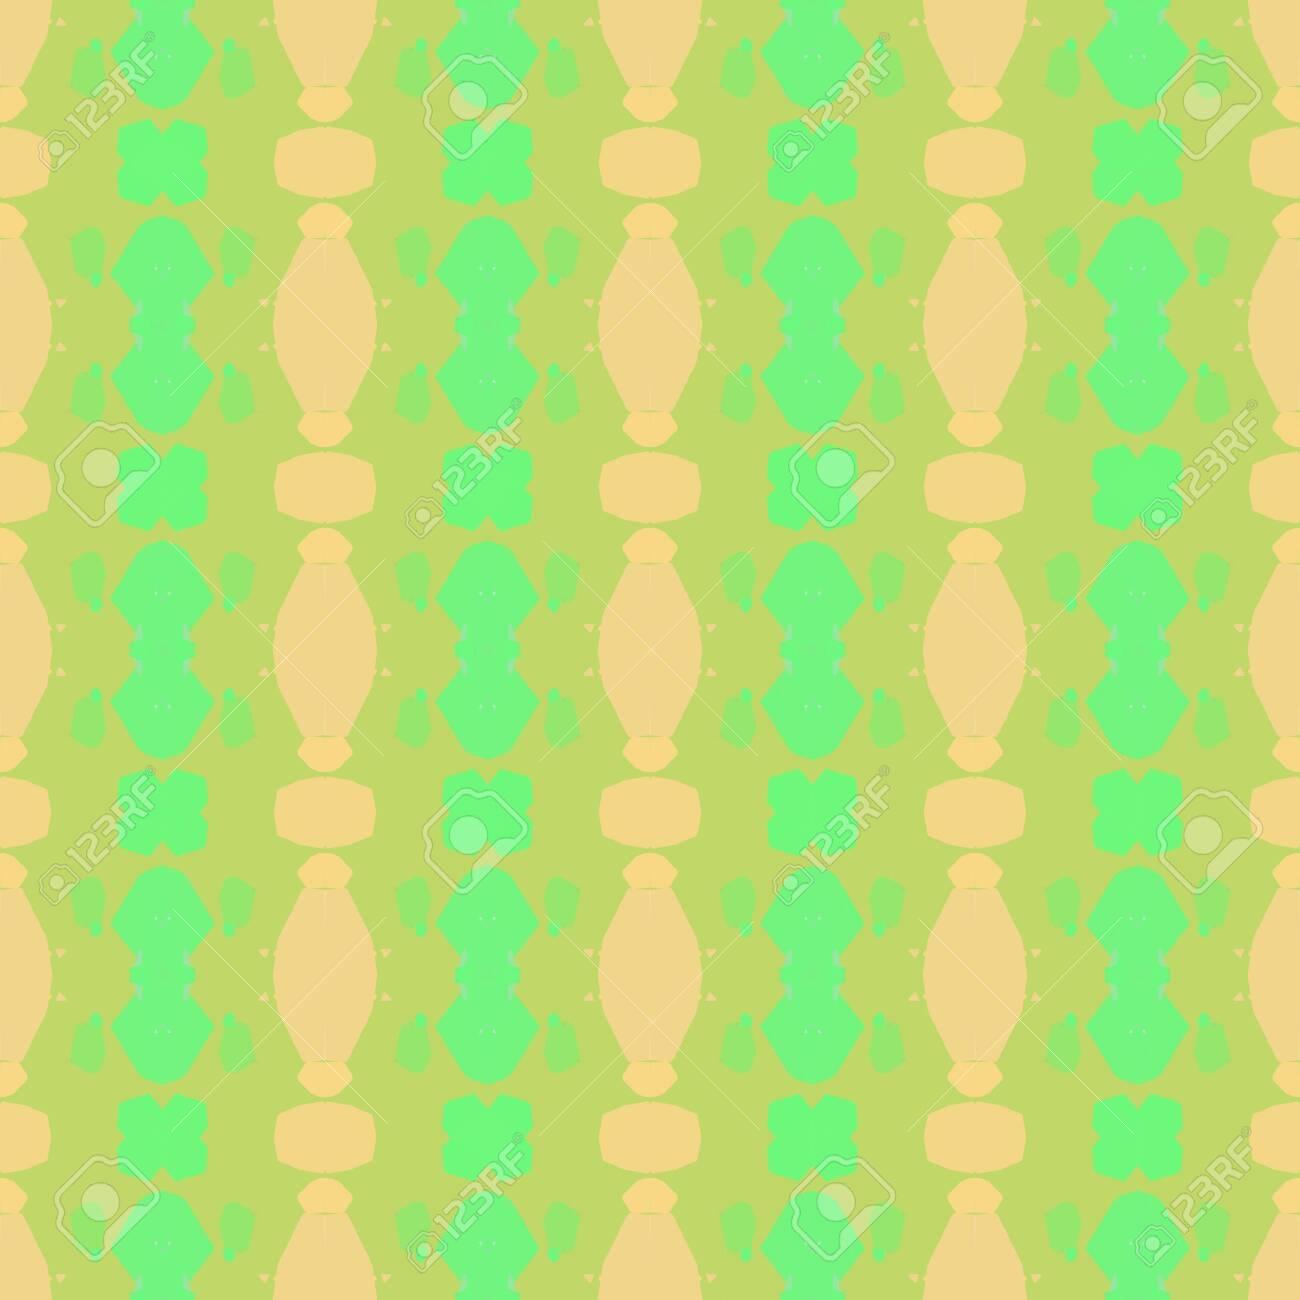 Seamless Pattern With Dark Khaki Pastel Green And Khaki Colors